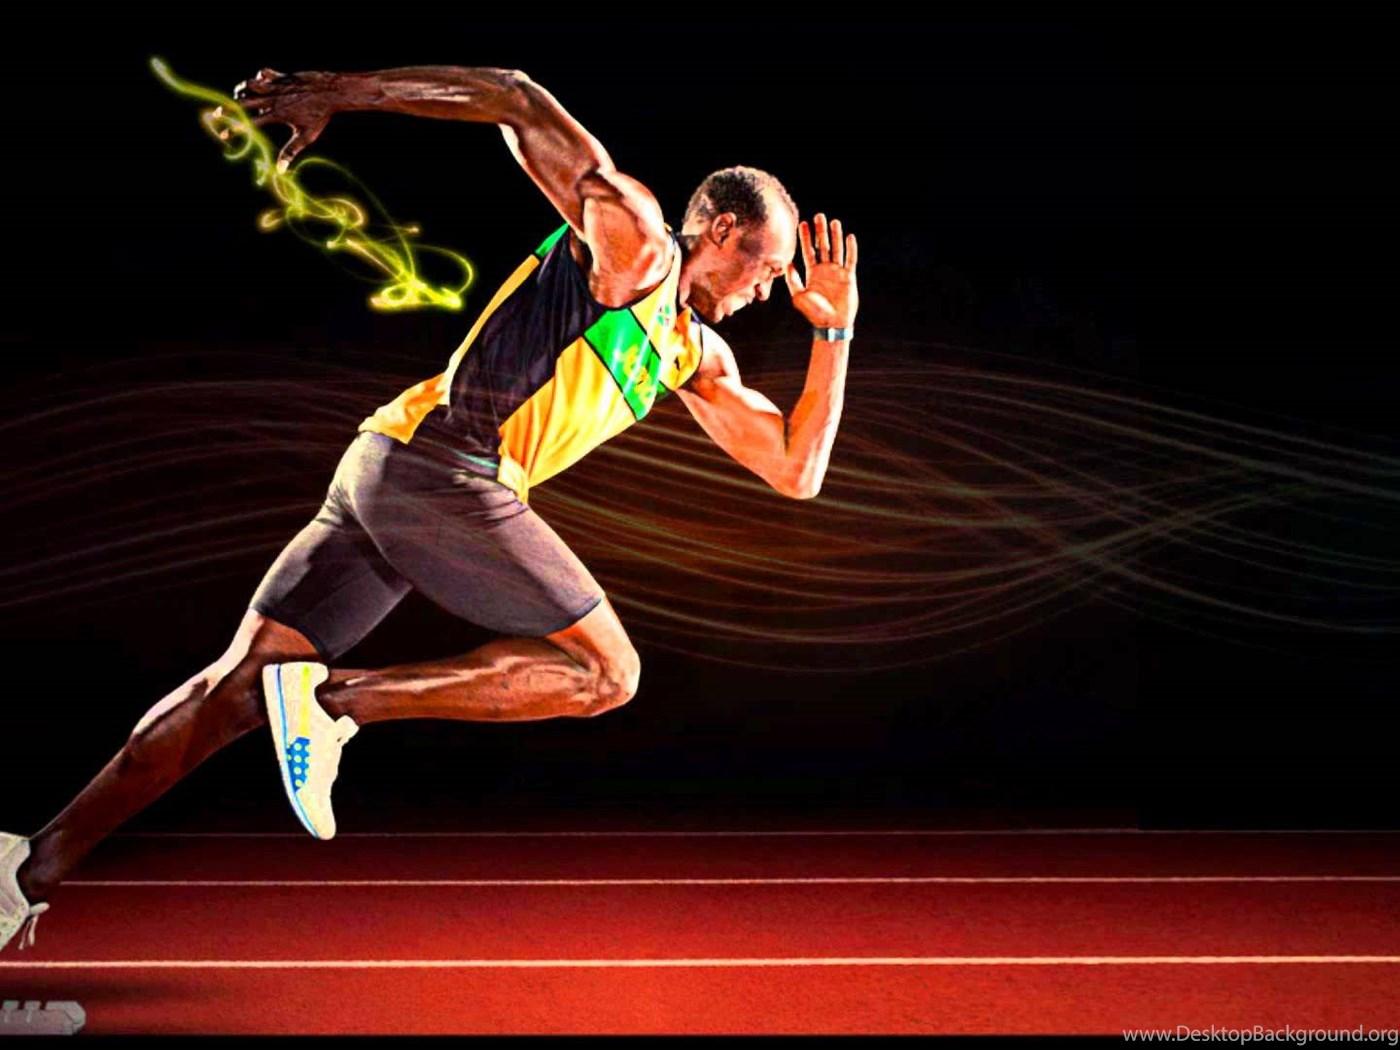 Usain Bolt Wallpapers Youtube Desktop Background